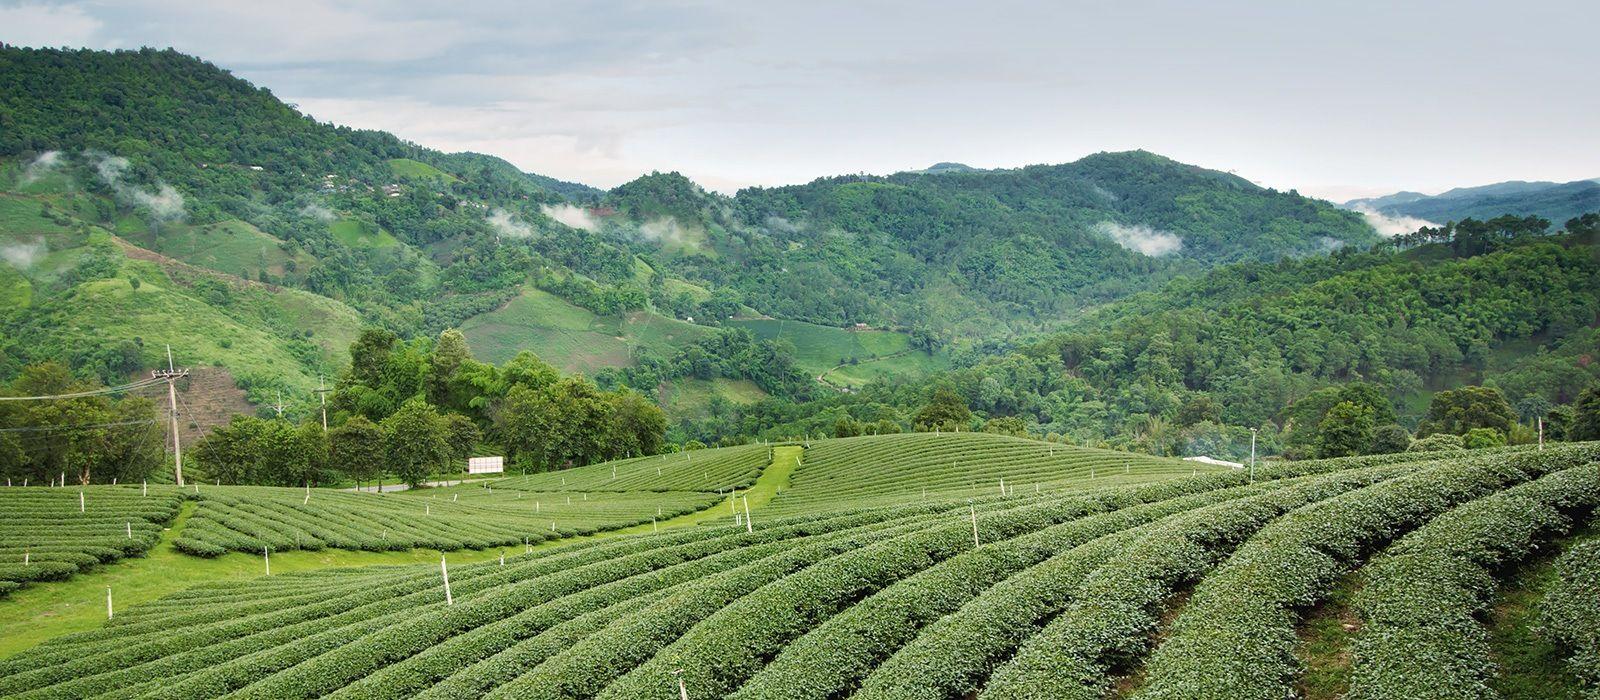 Darjeeling: Teegenuss & Berge Urlaub 1